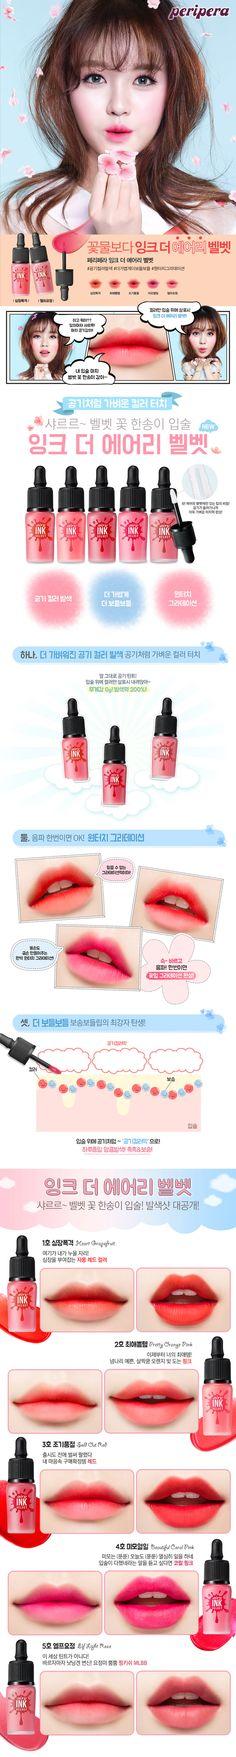 PeriPera,Makeup,Makeup Lip,Lip Stain,NewArrival-20172,,